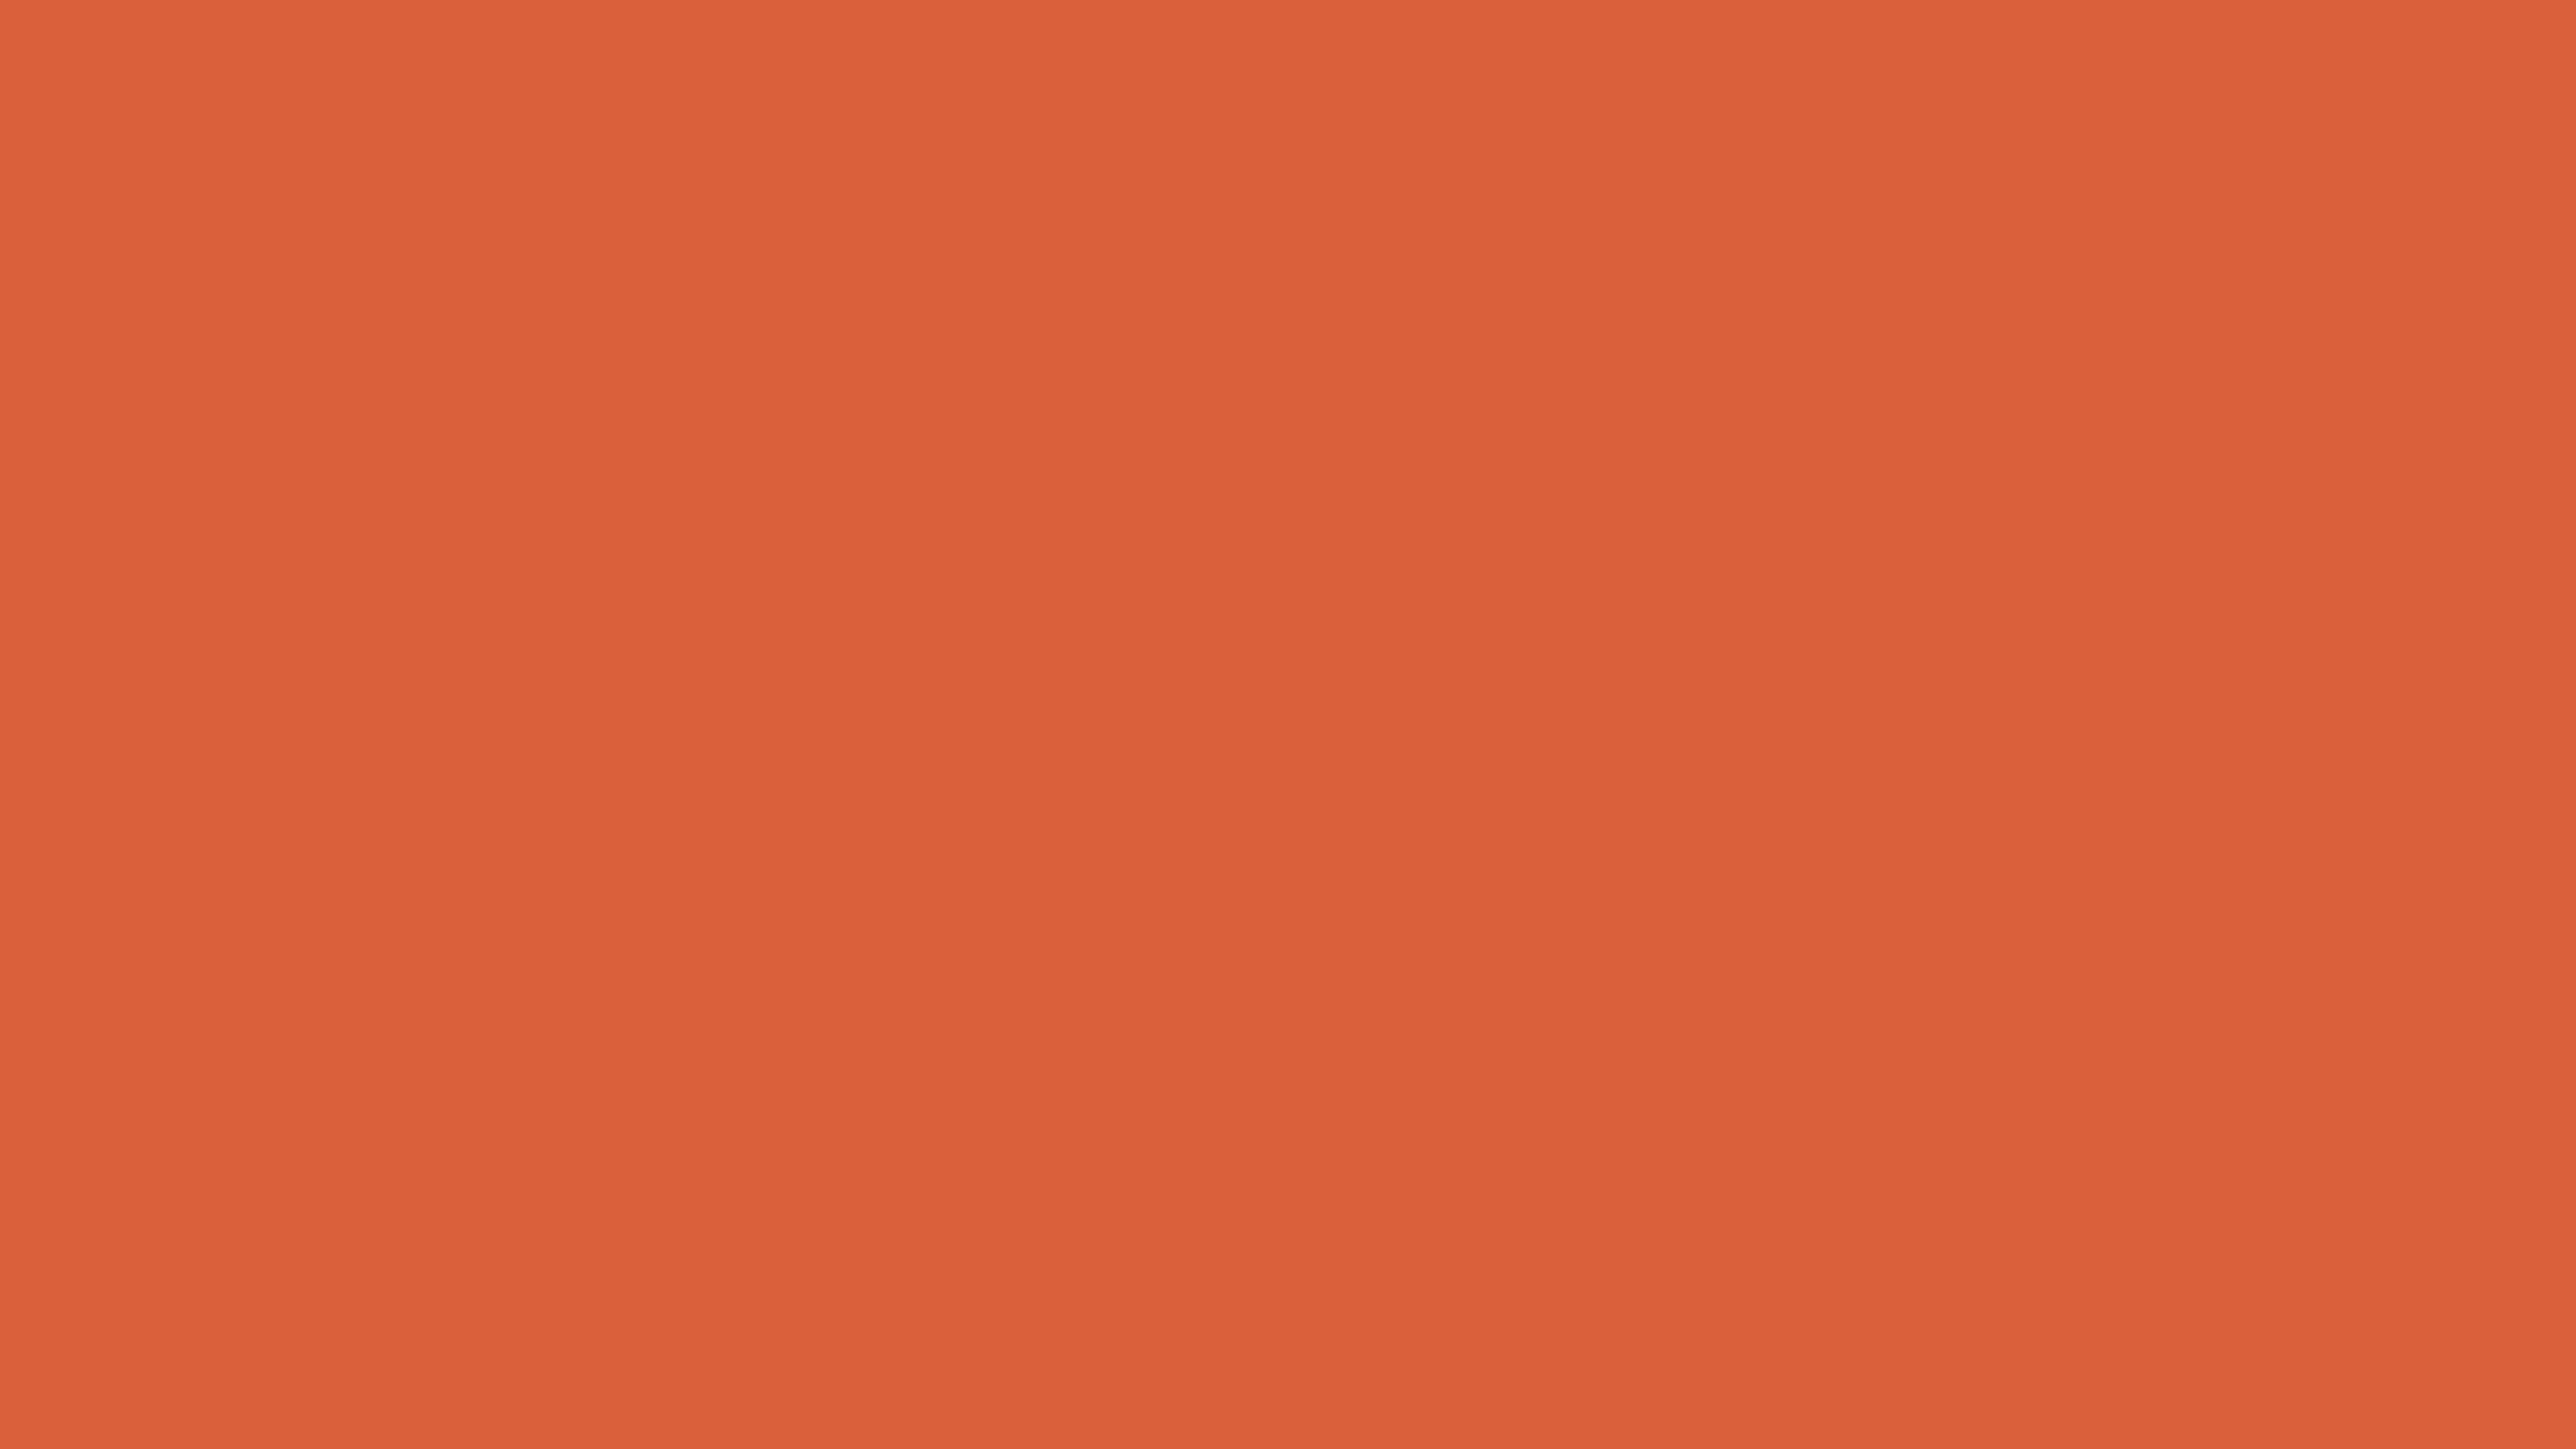 4096x2304 Medium Vermilion Solid Color Background